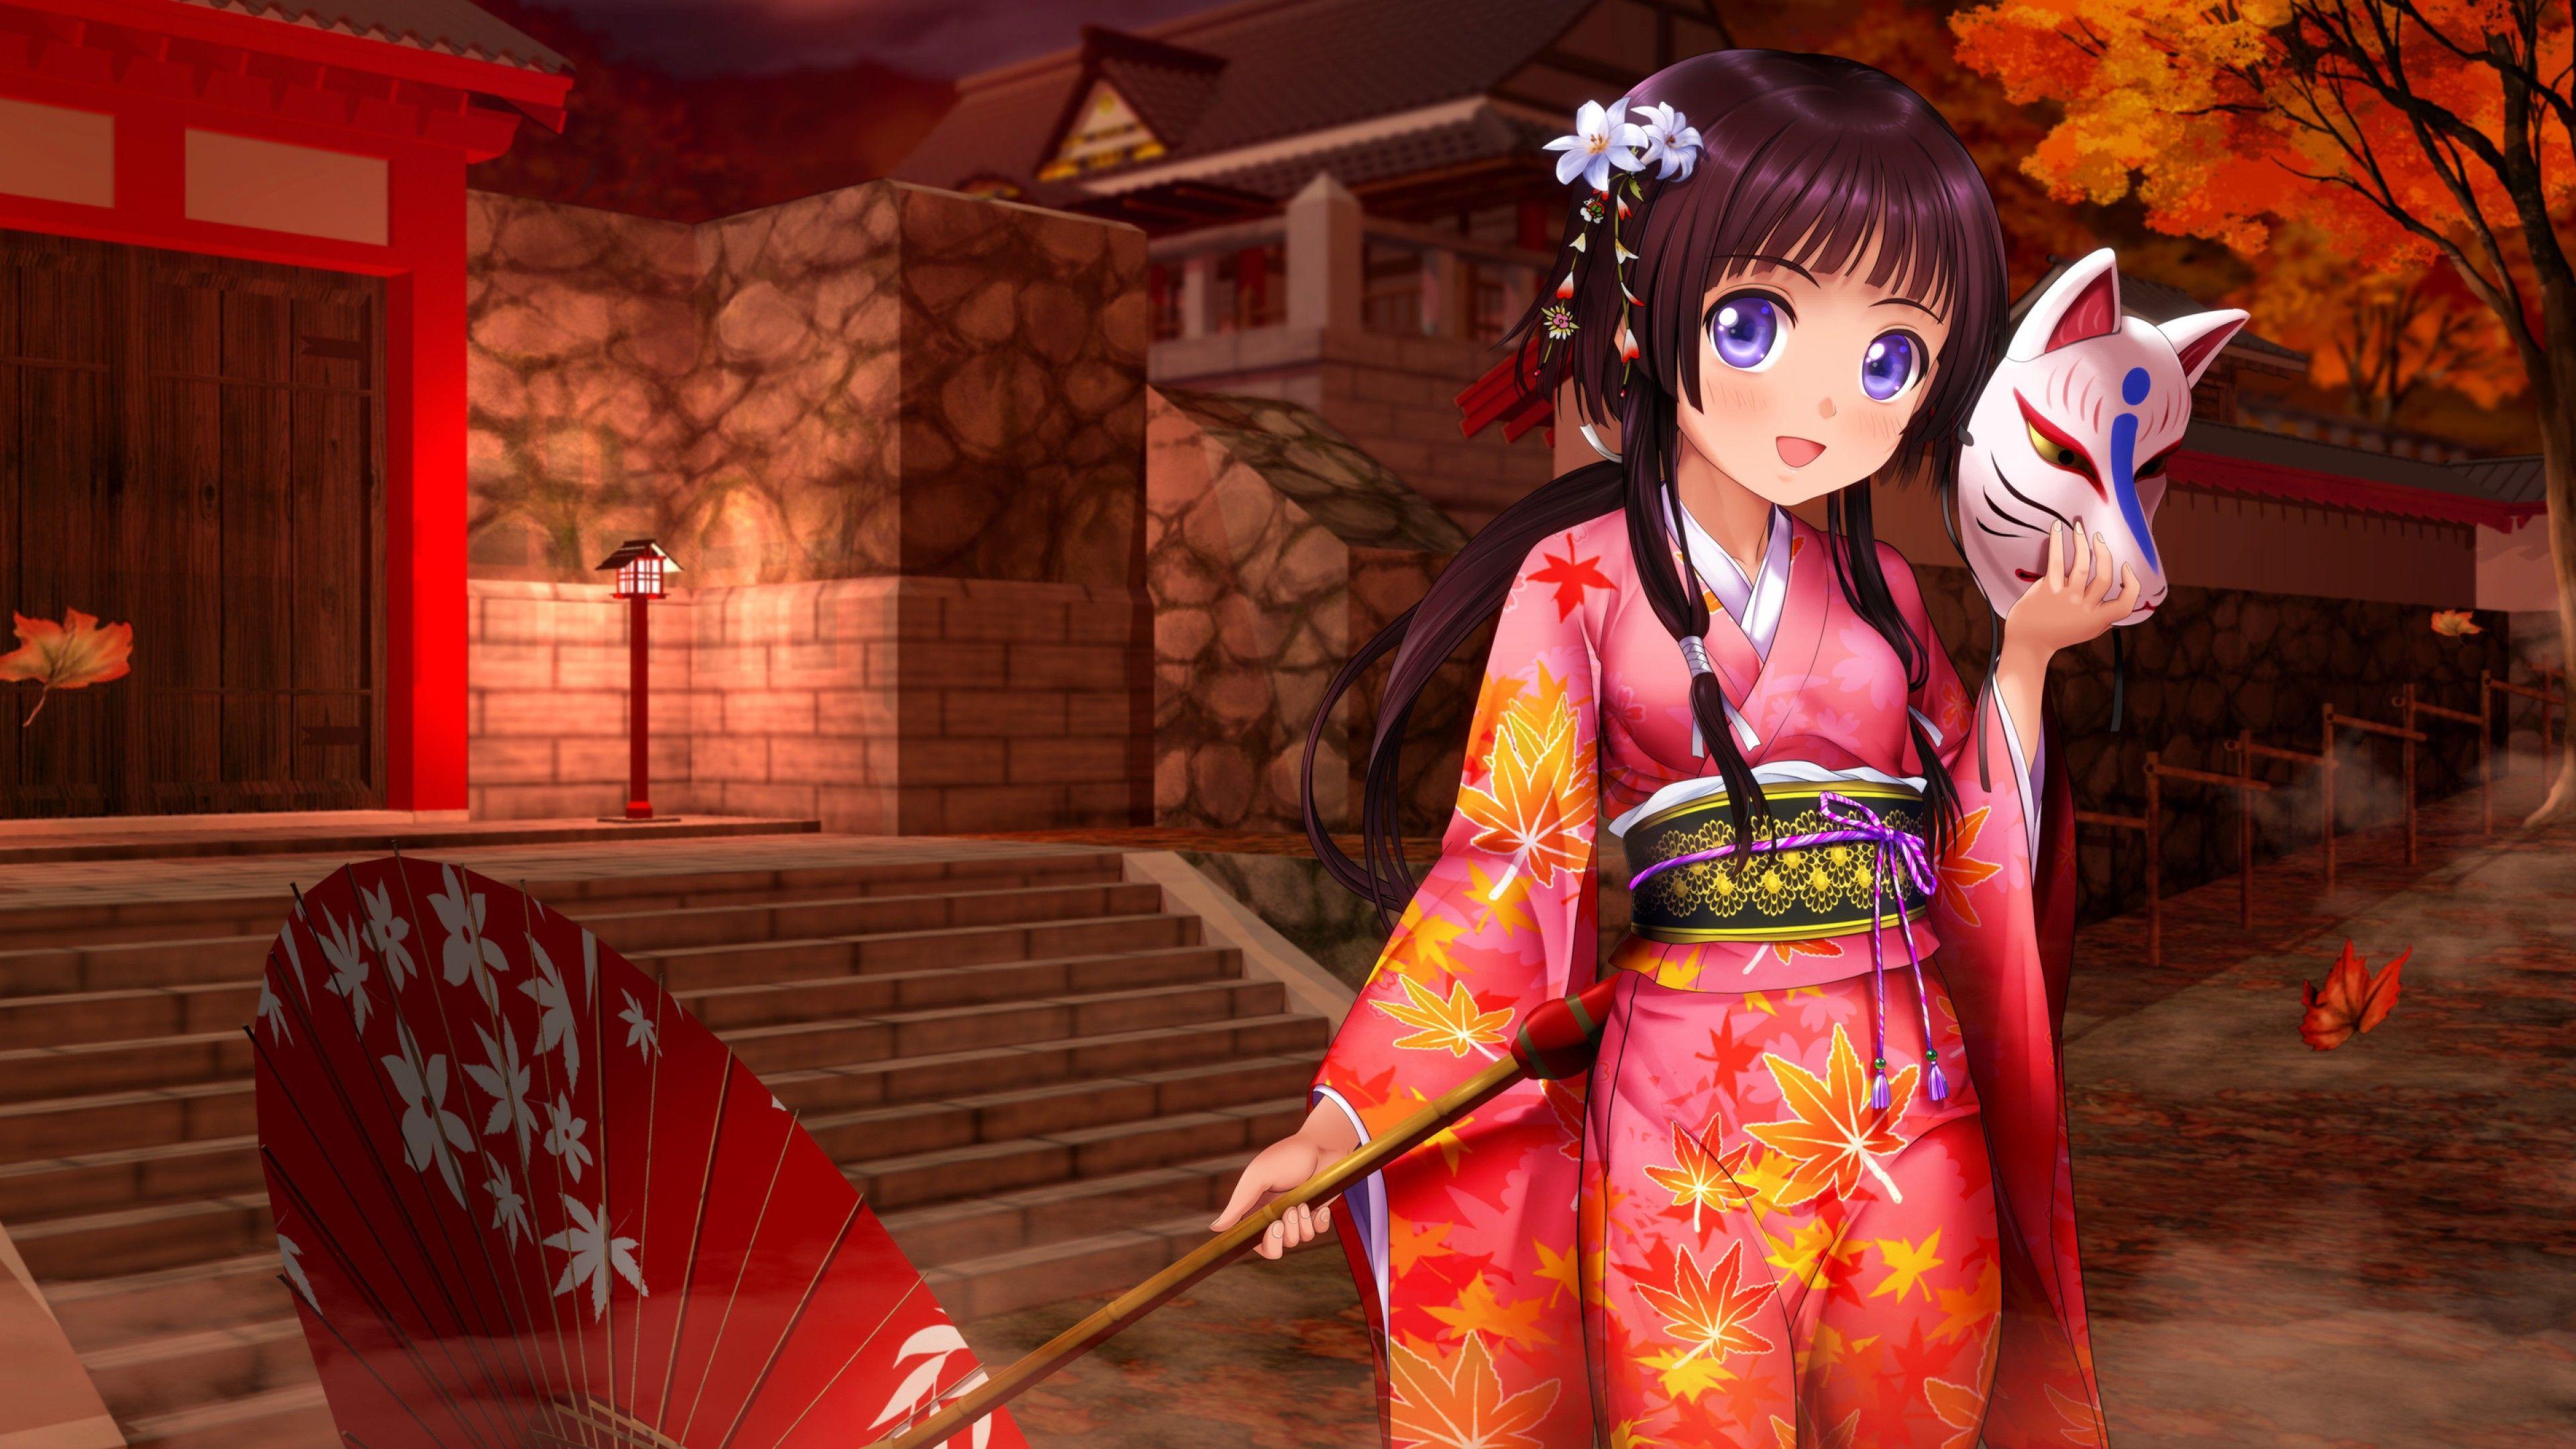 Download wallpaper 3840x2400 girl, umbrella, anime, rain